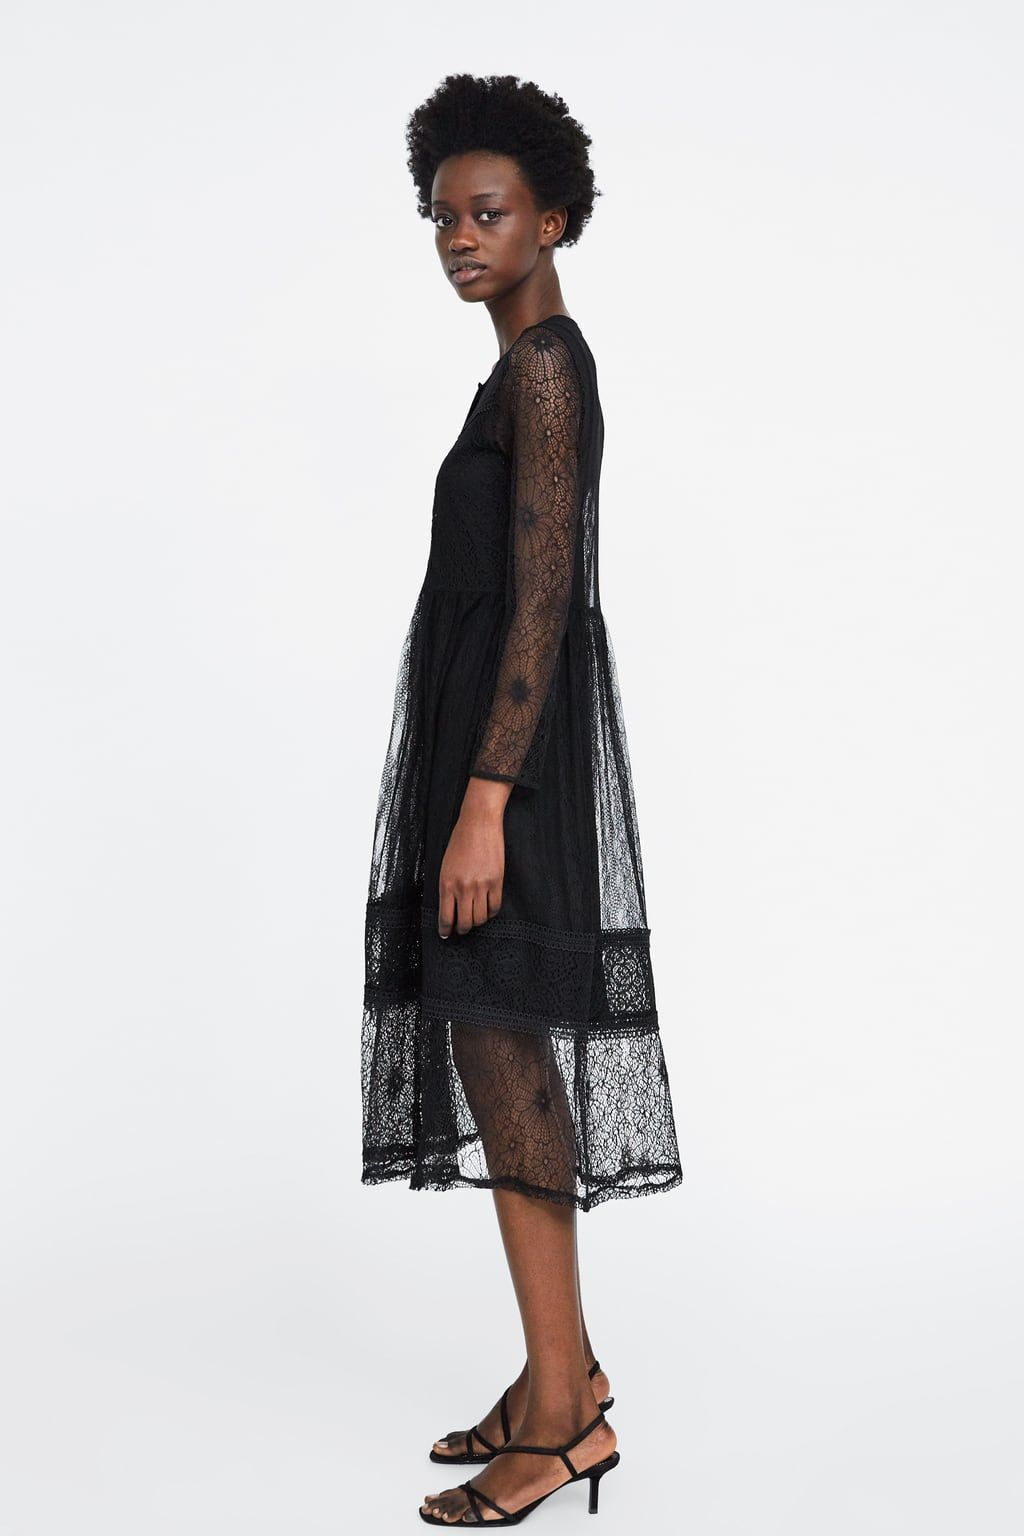 Pin On Zara Colección Primavera Verano 2019